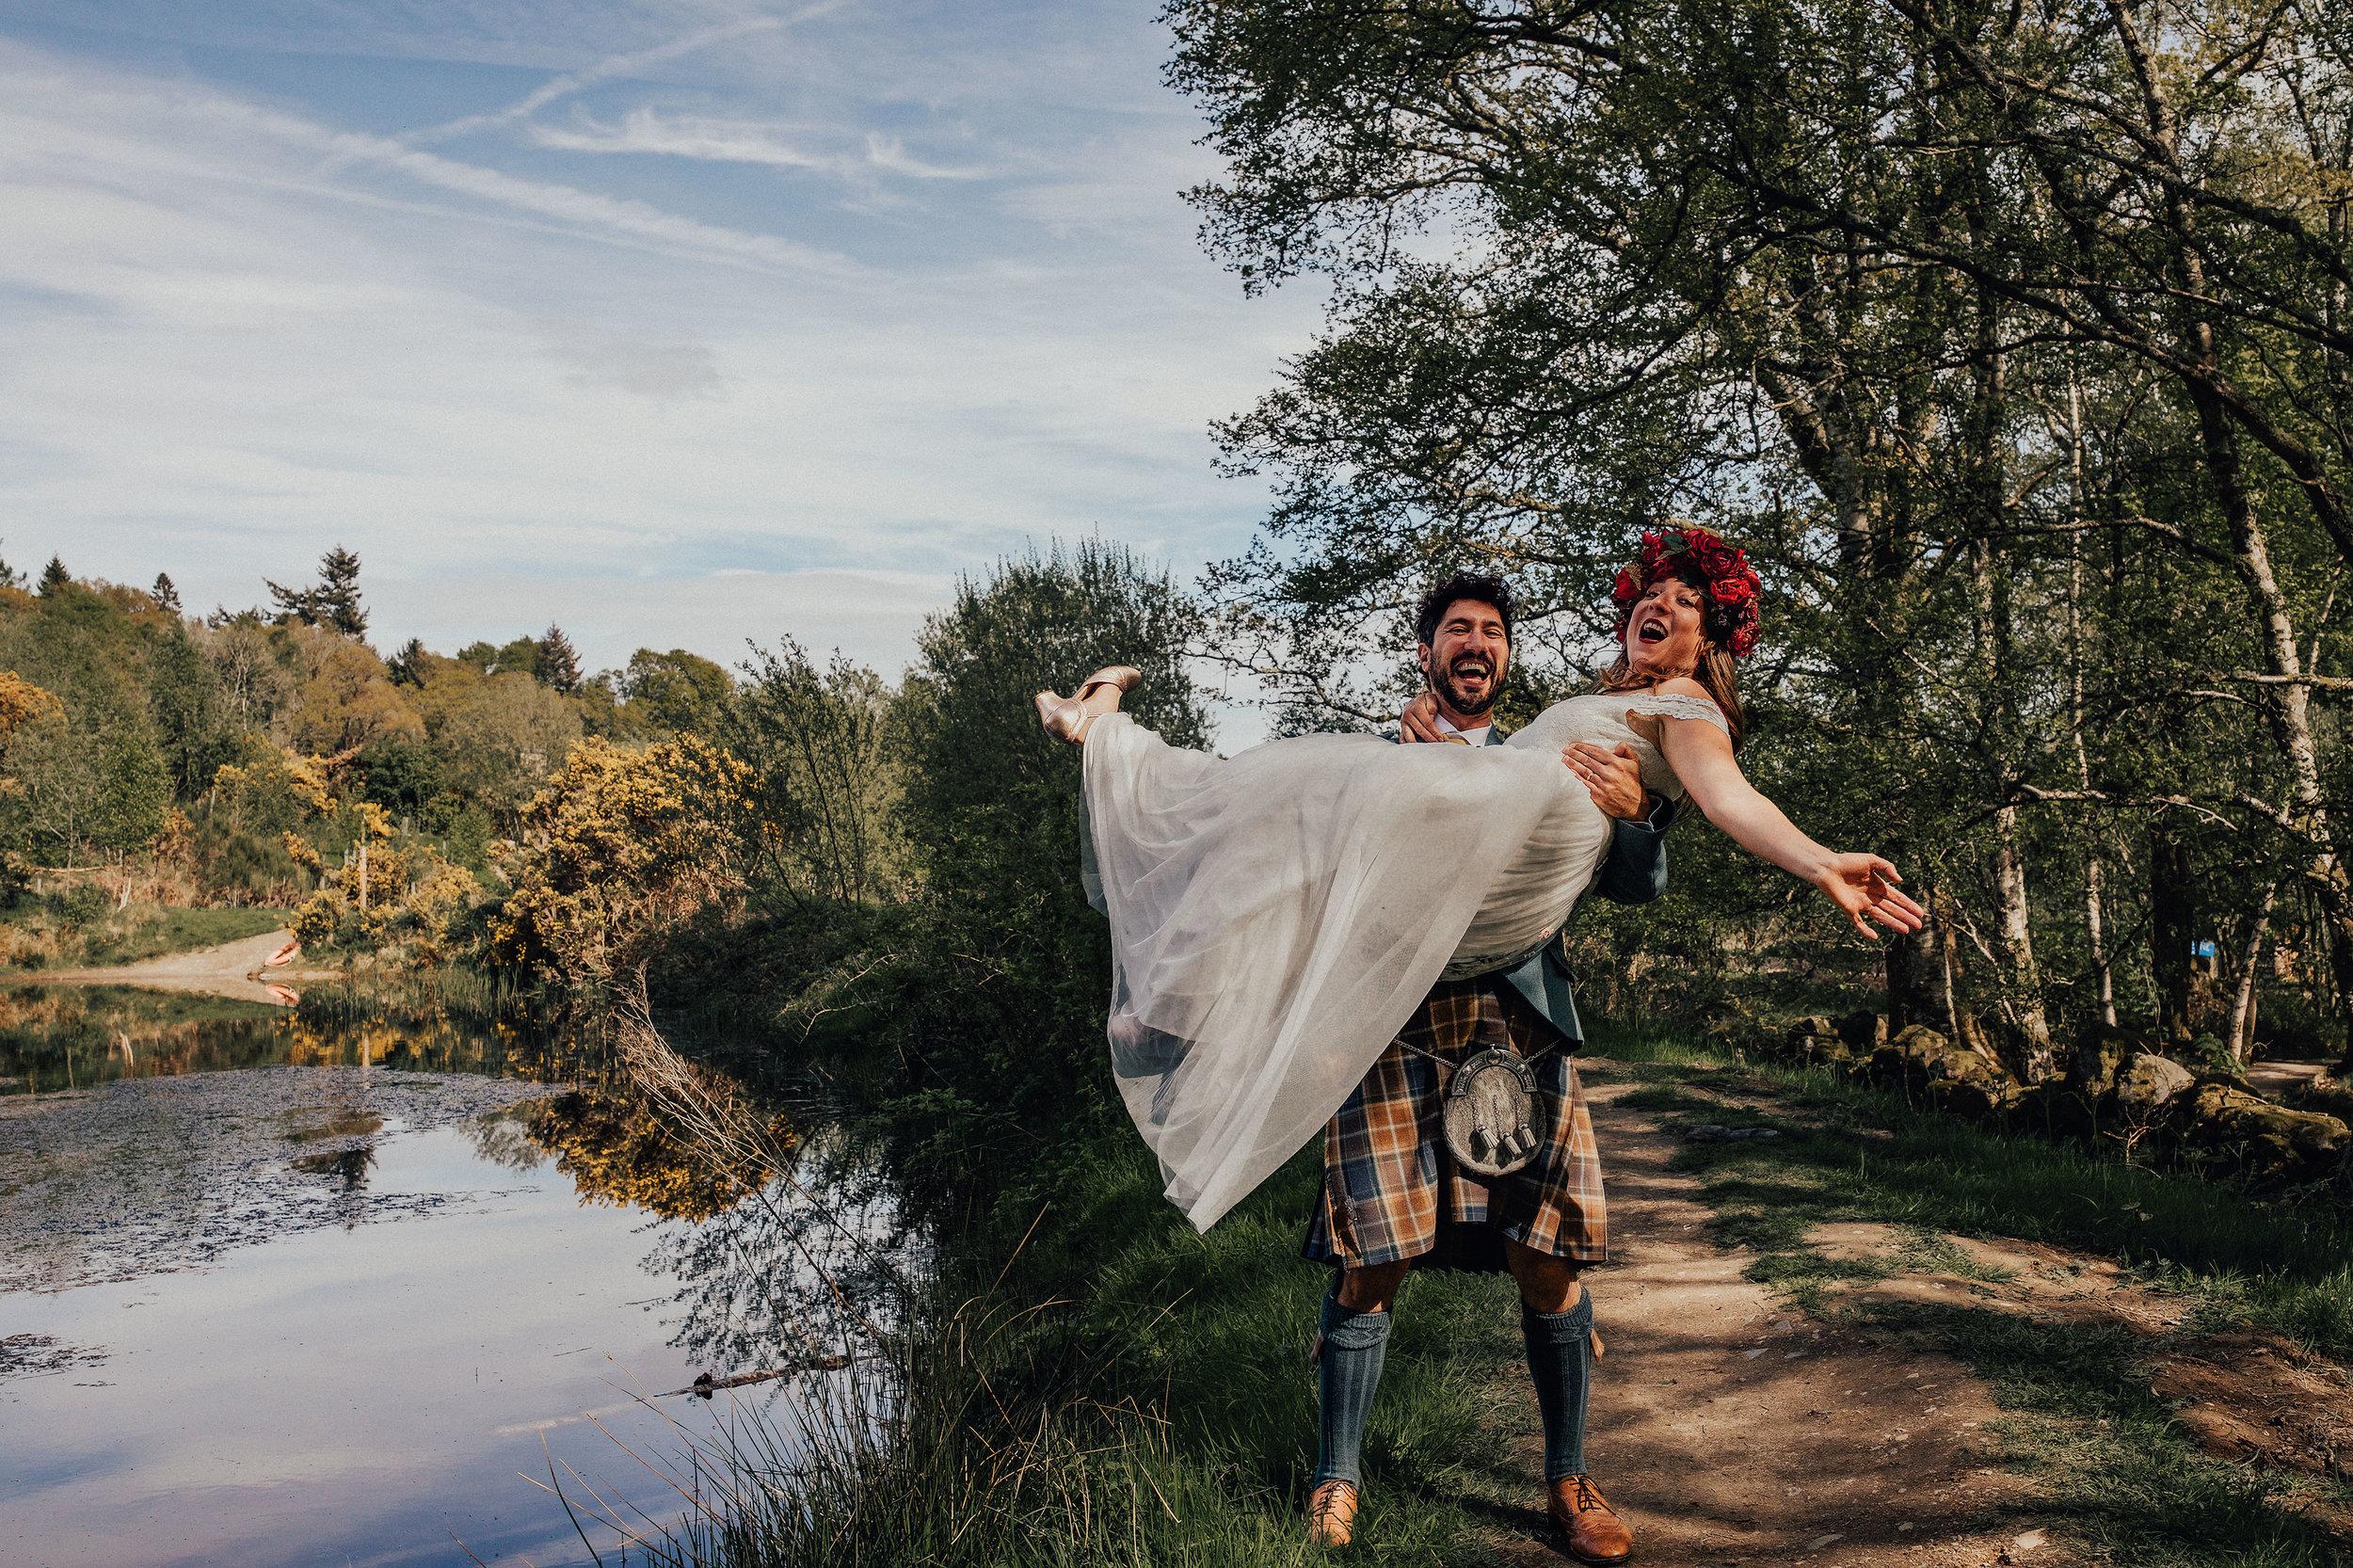 COMRIE_CROFT_WEDDINGS_PJ_PHILLIPS_PHOTOGRAPHY_105.jpg